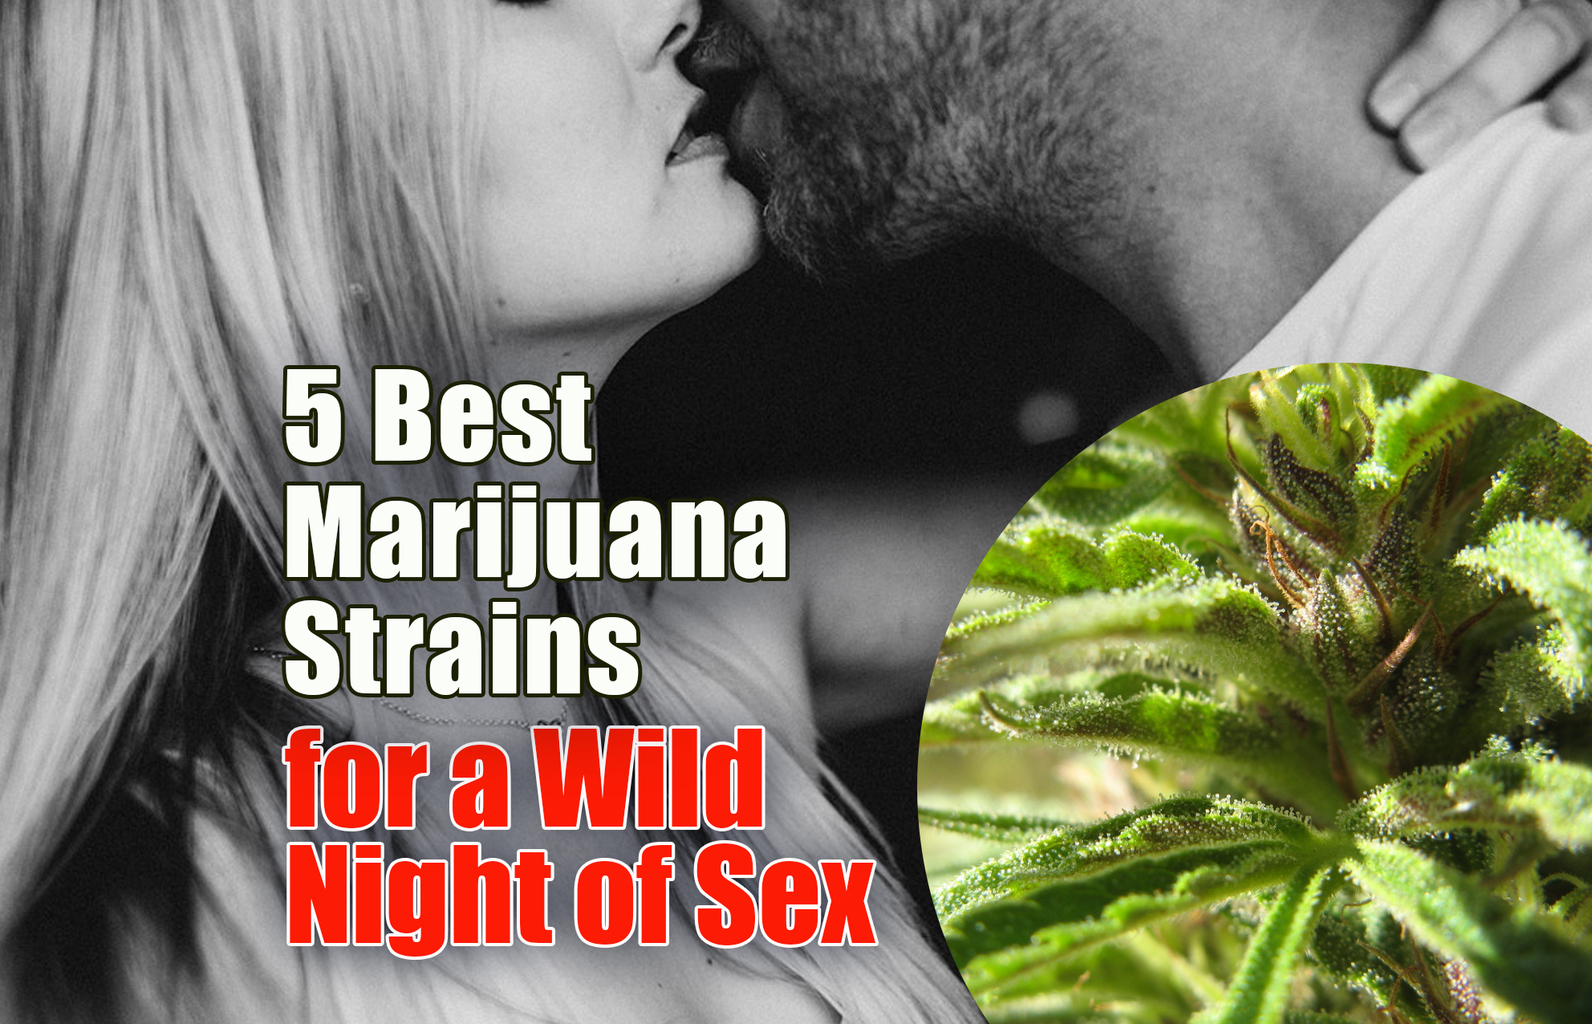 5 Best Marijuana Strains for a Wild Night of Sex